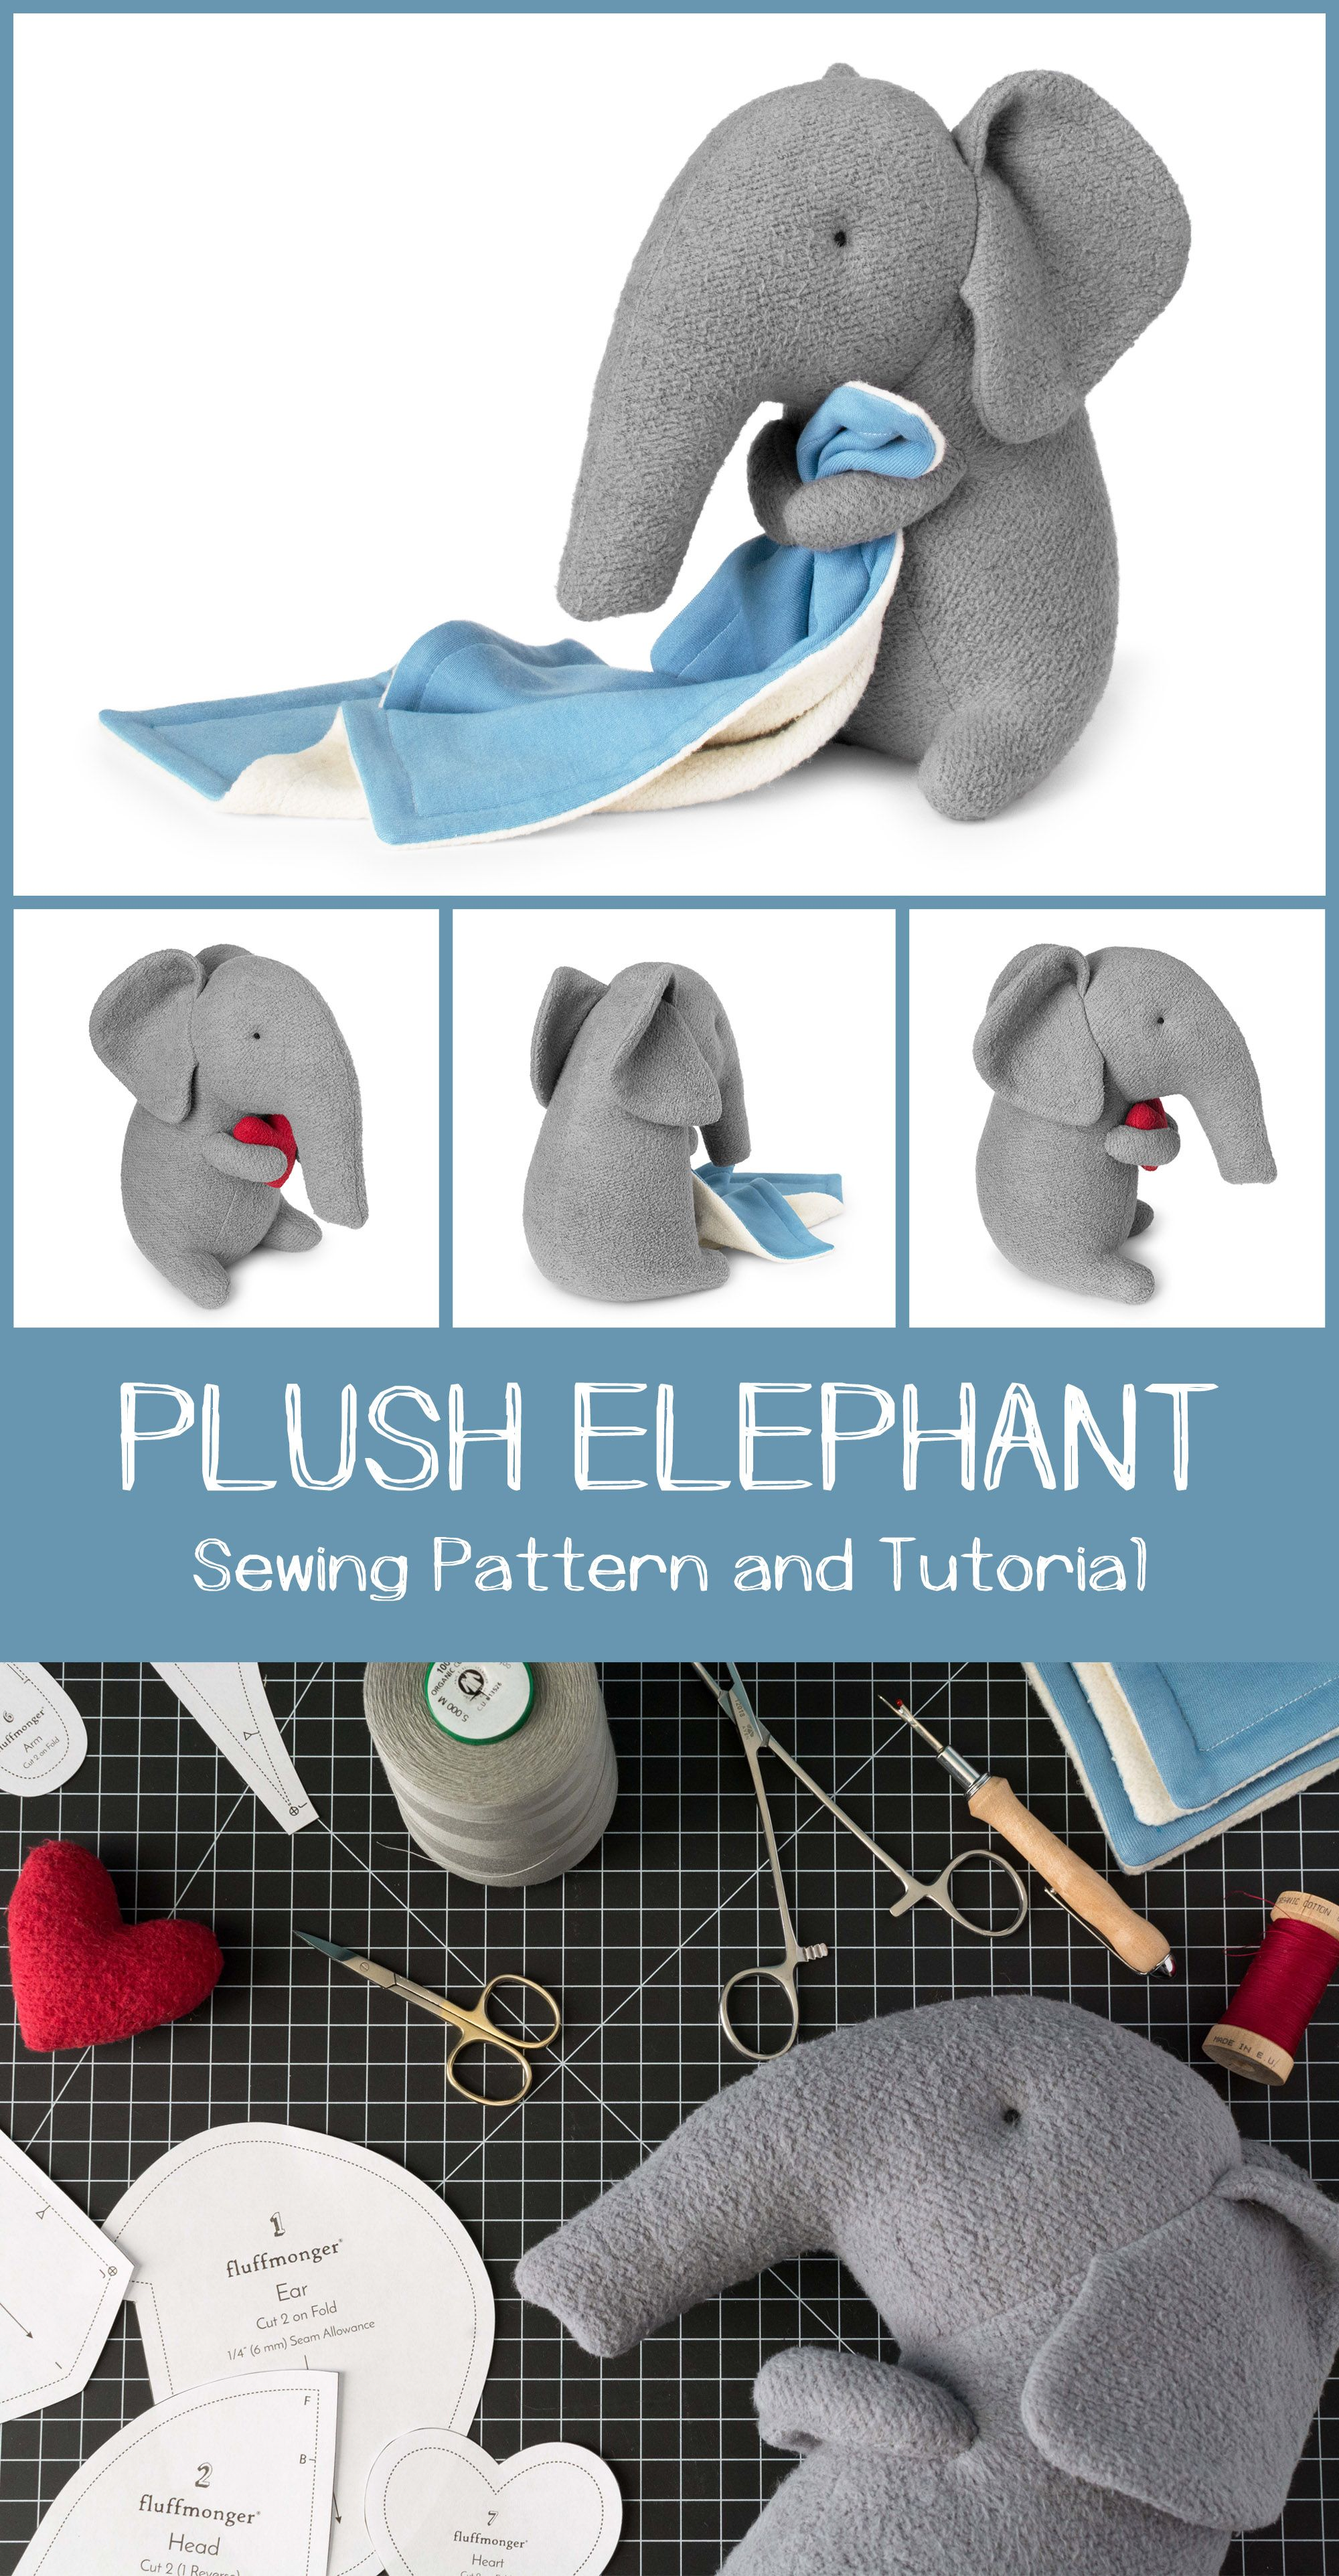 Plush Elephant Sewing Pattern